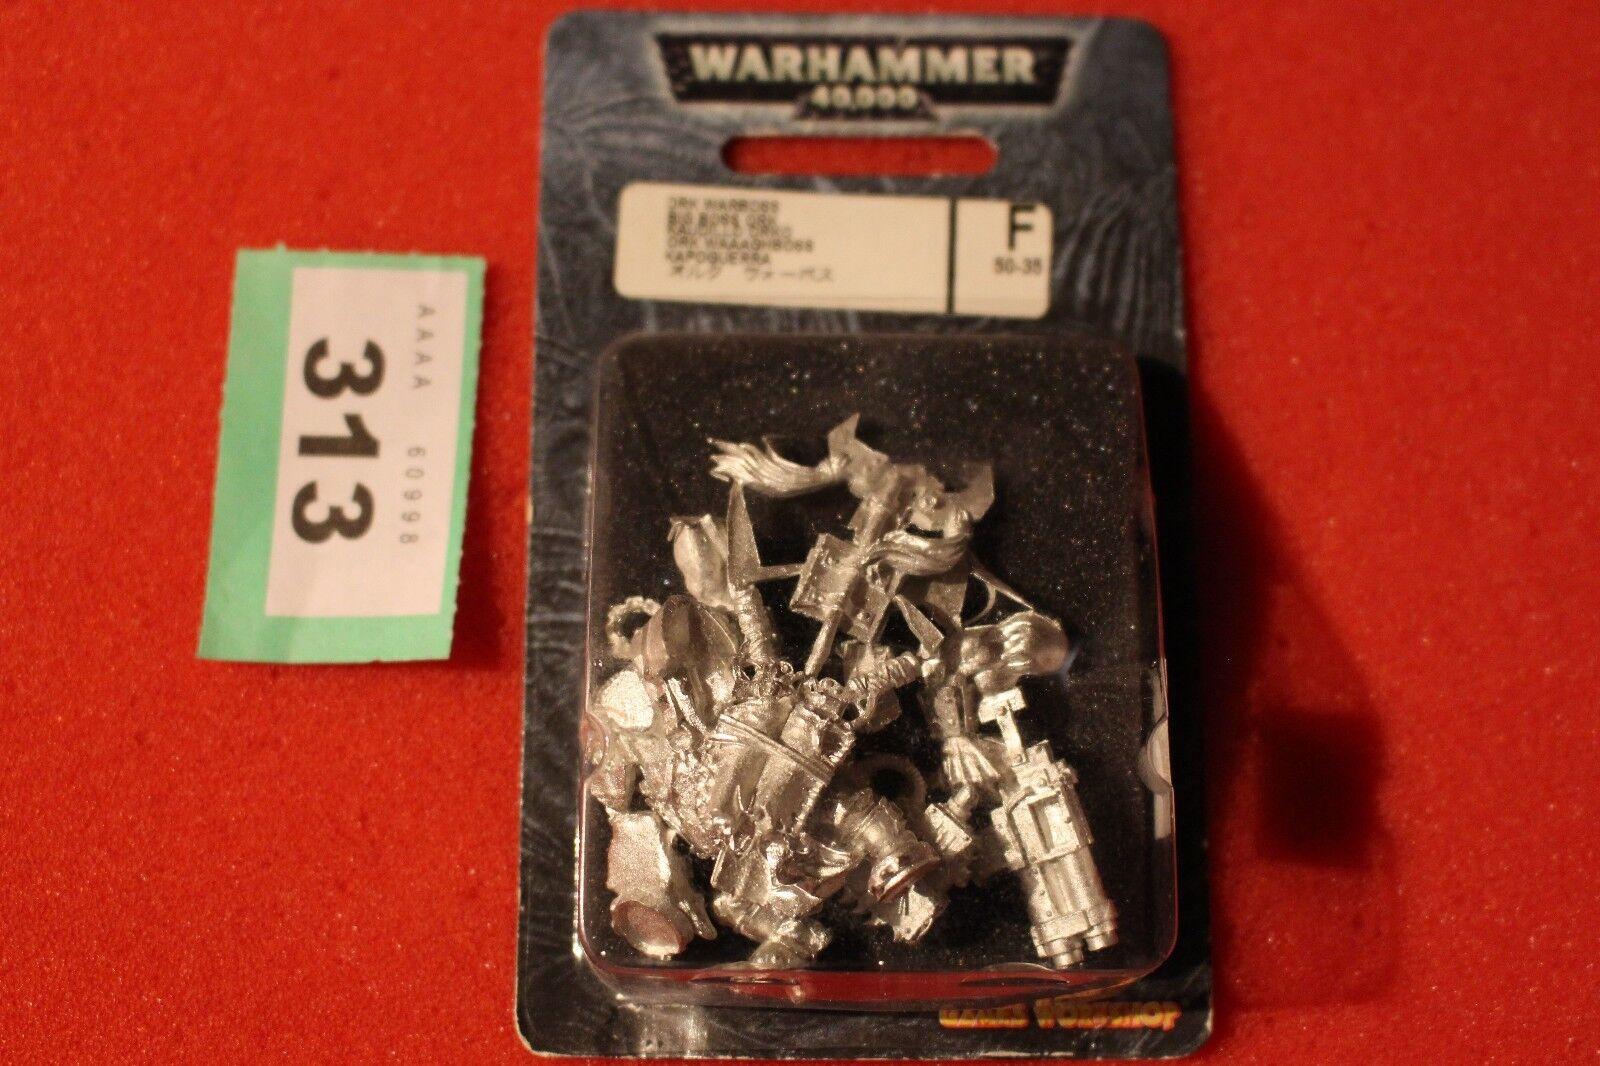 Games Workshop Warhammer 40k Orks Warboss with Big Choppa Metal BNIB New WH40K